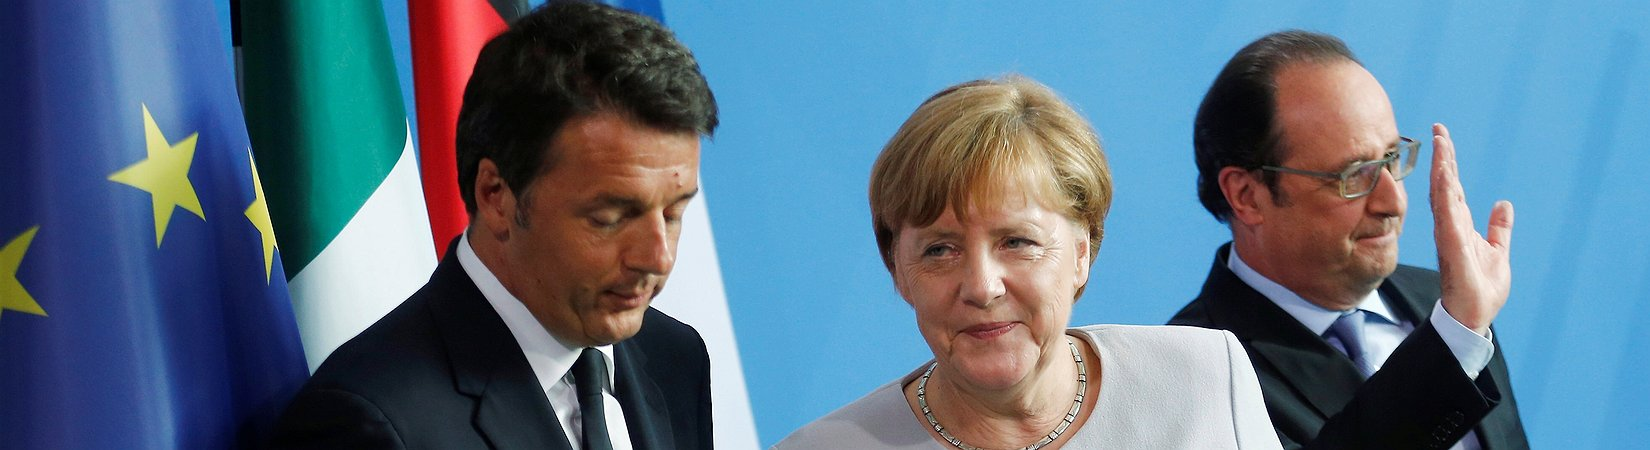 Merkel, Hollande, Renzi: simbolismo, pero sin sustancia